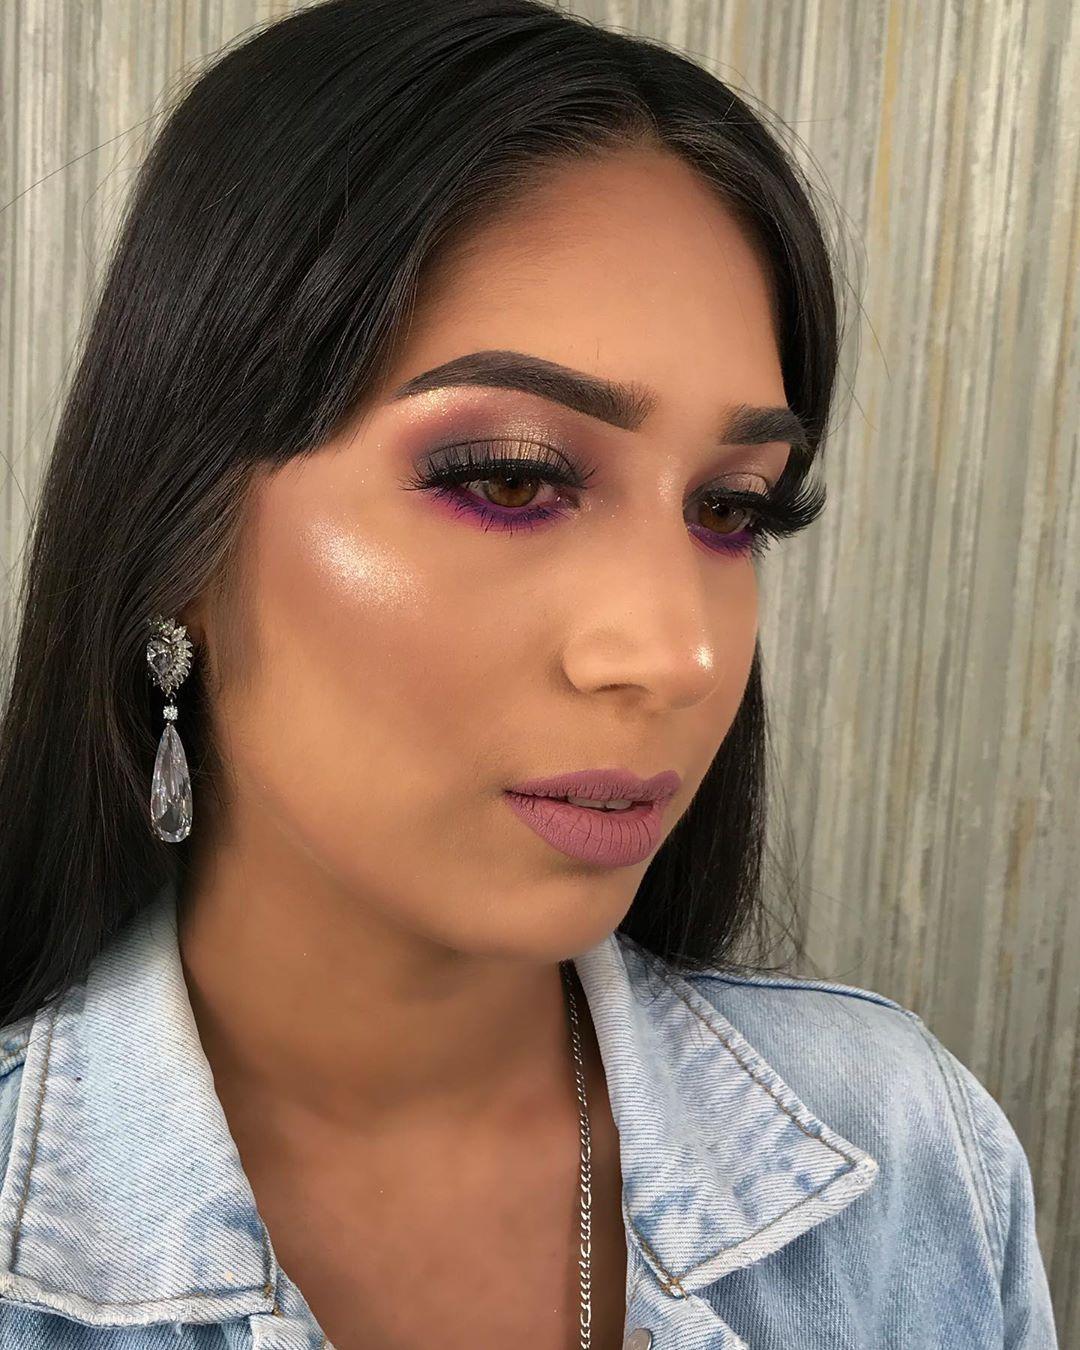 Técnica luz abierta piel de porcelana maquillaje social